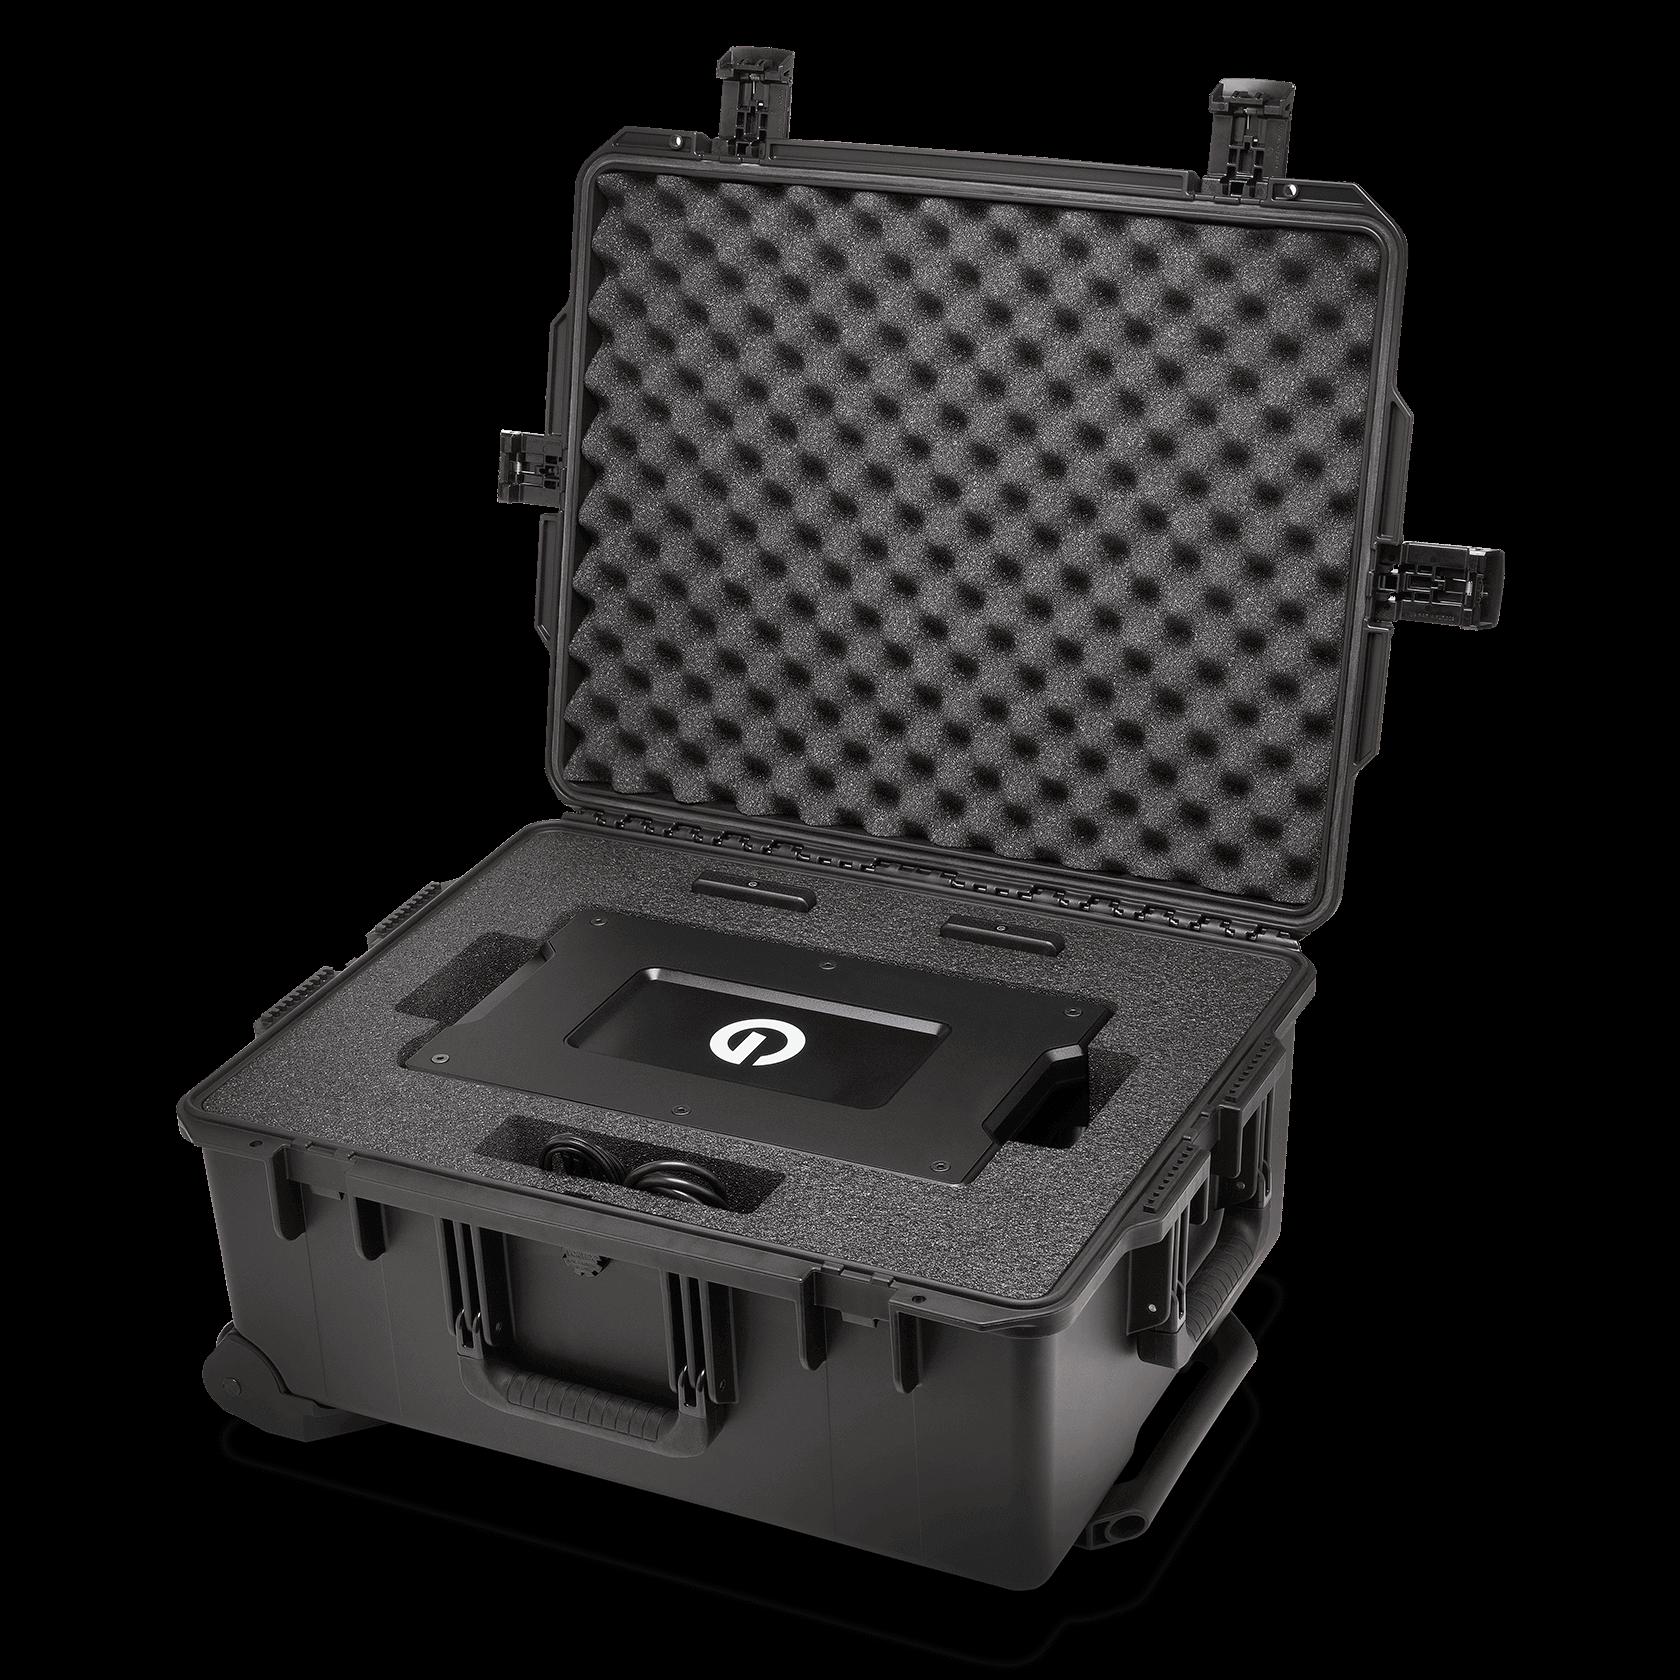 WesternDigital coupon: G-Technology Shuttle XL Case Peli IM2720 ev modules Foam, 8-bay Storage System - 0G04983-1